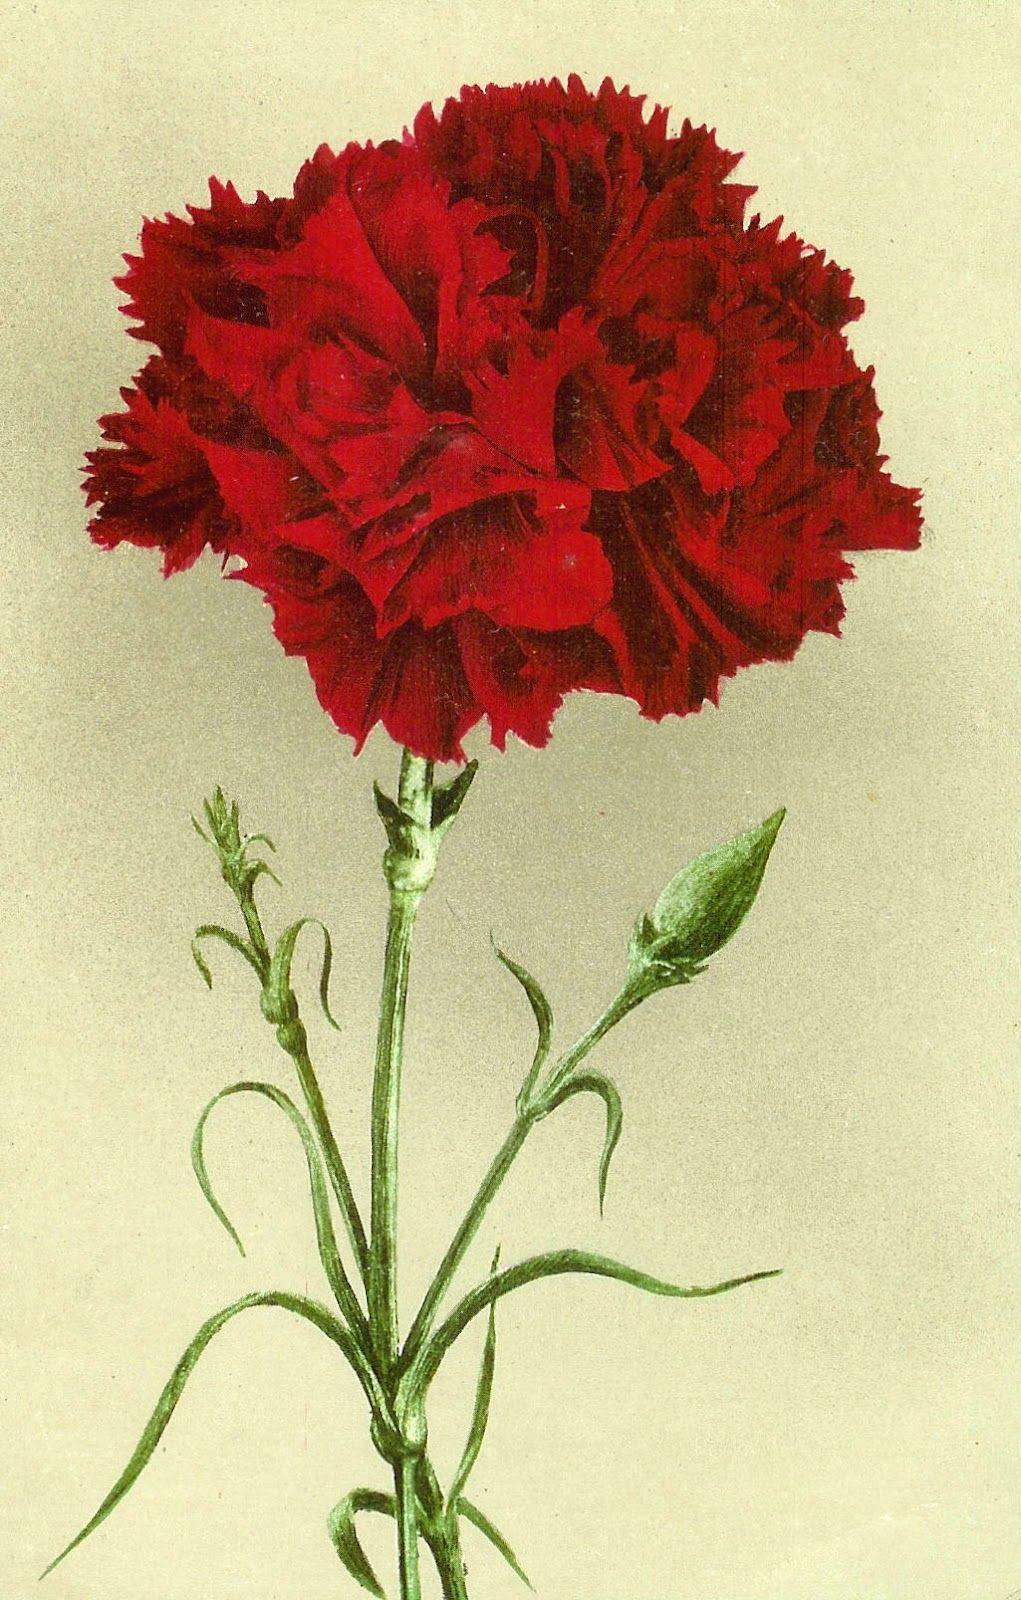 Red carnation..